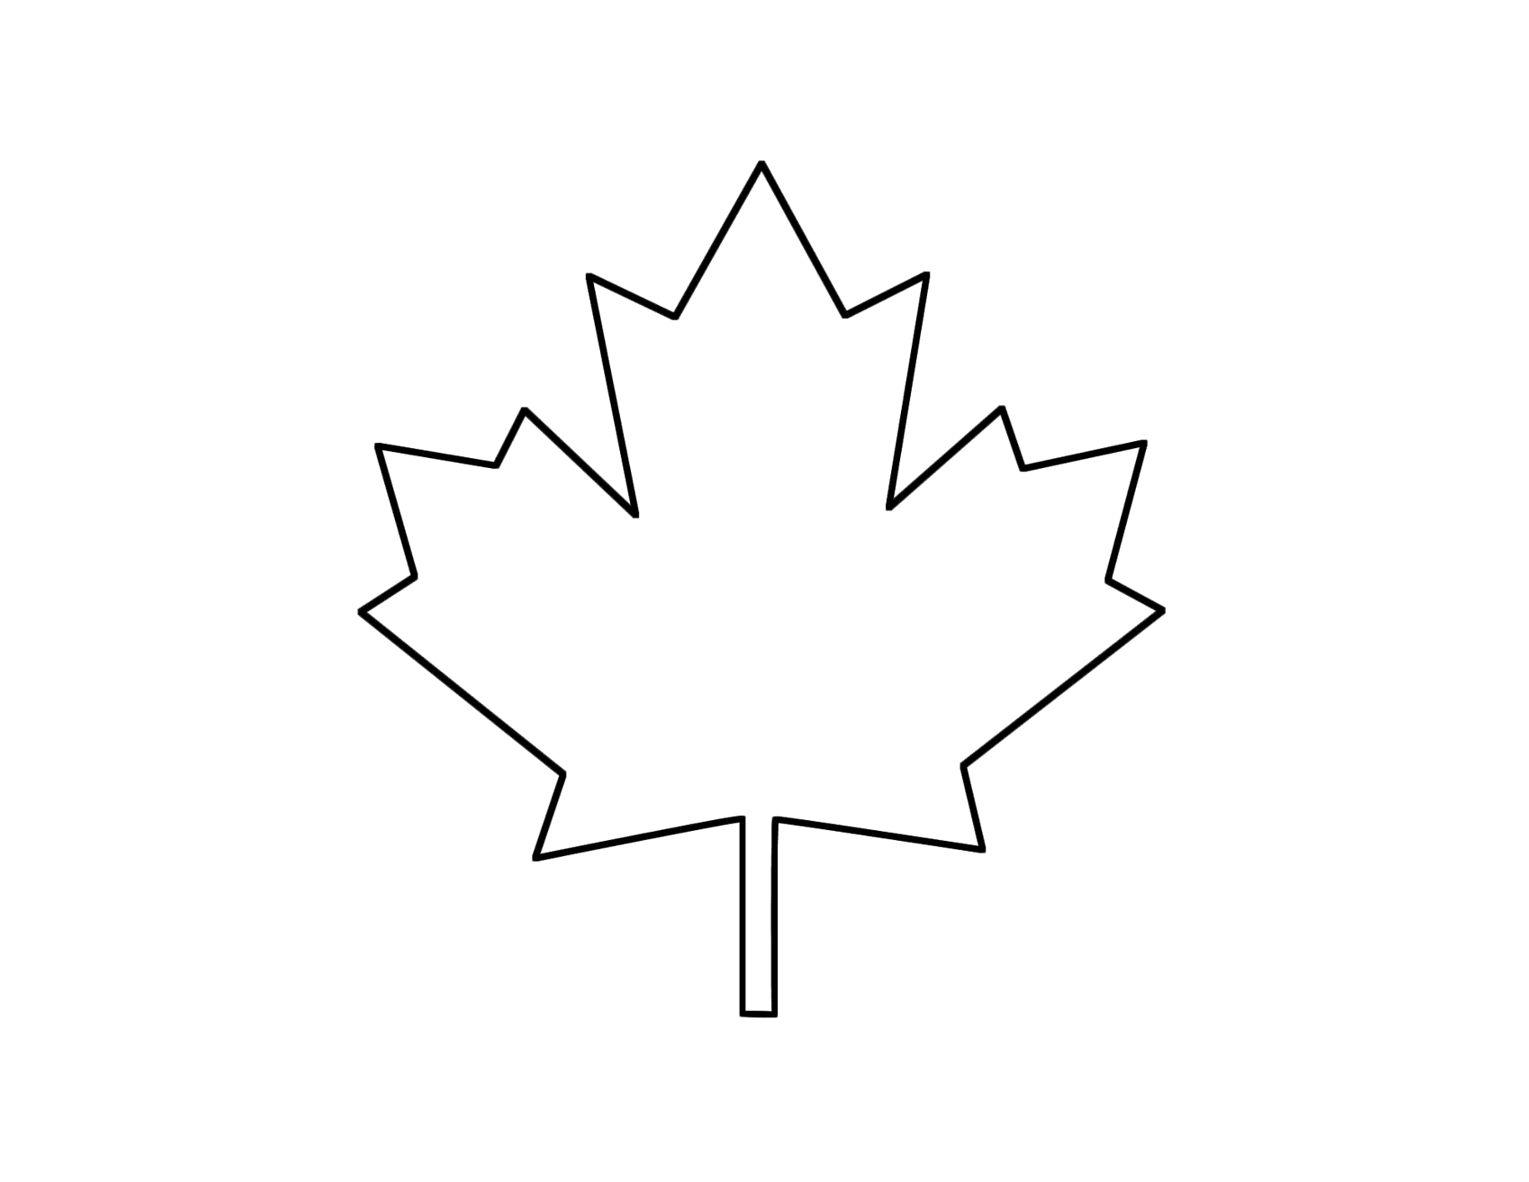 maple-leaf-template http://www.kidsinthecapital.ca/2012/06/28 ...